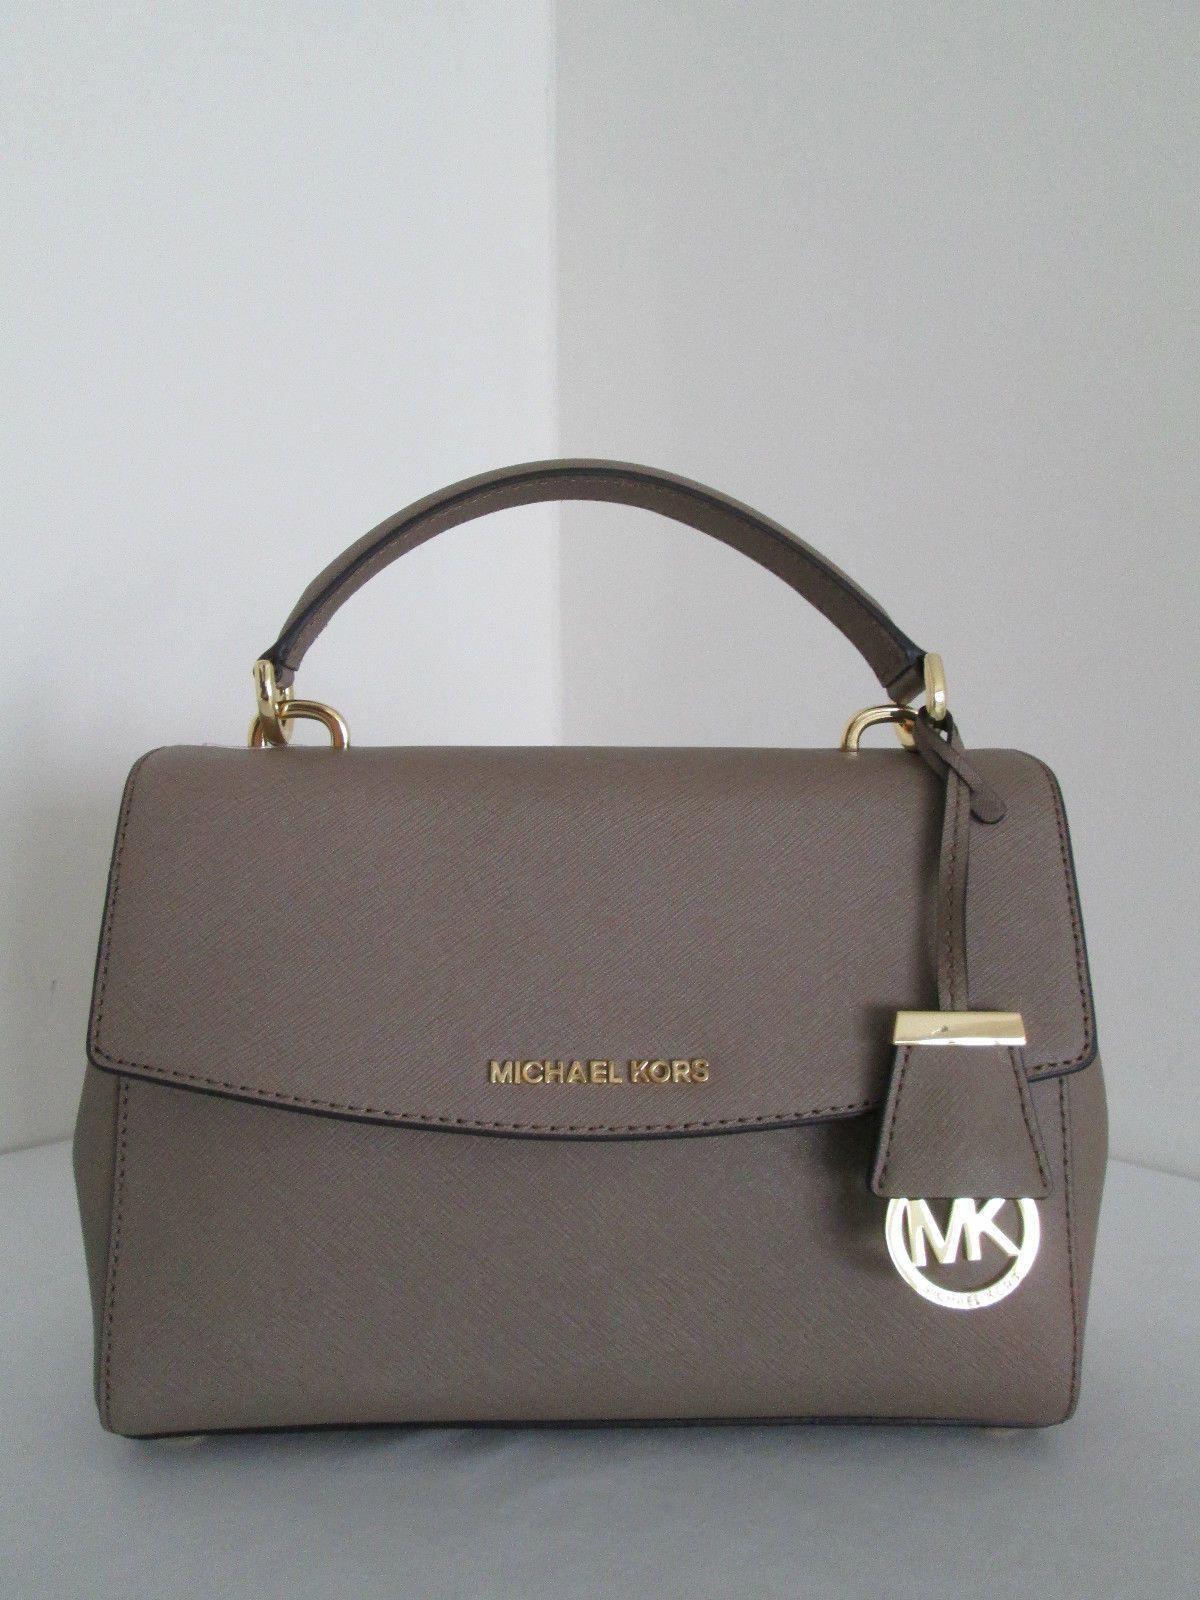 f268a16003ff Michael Kors AVA Dark Dune Small Satchel Saffiano Leather Handbag ...